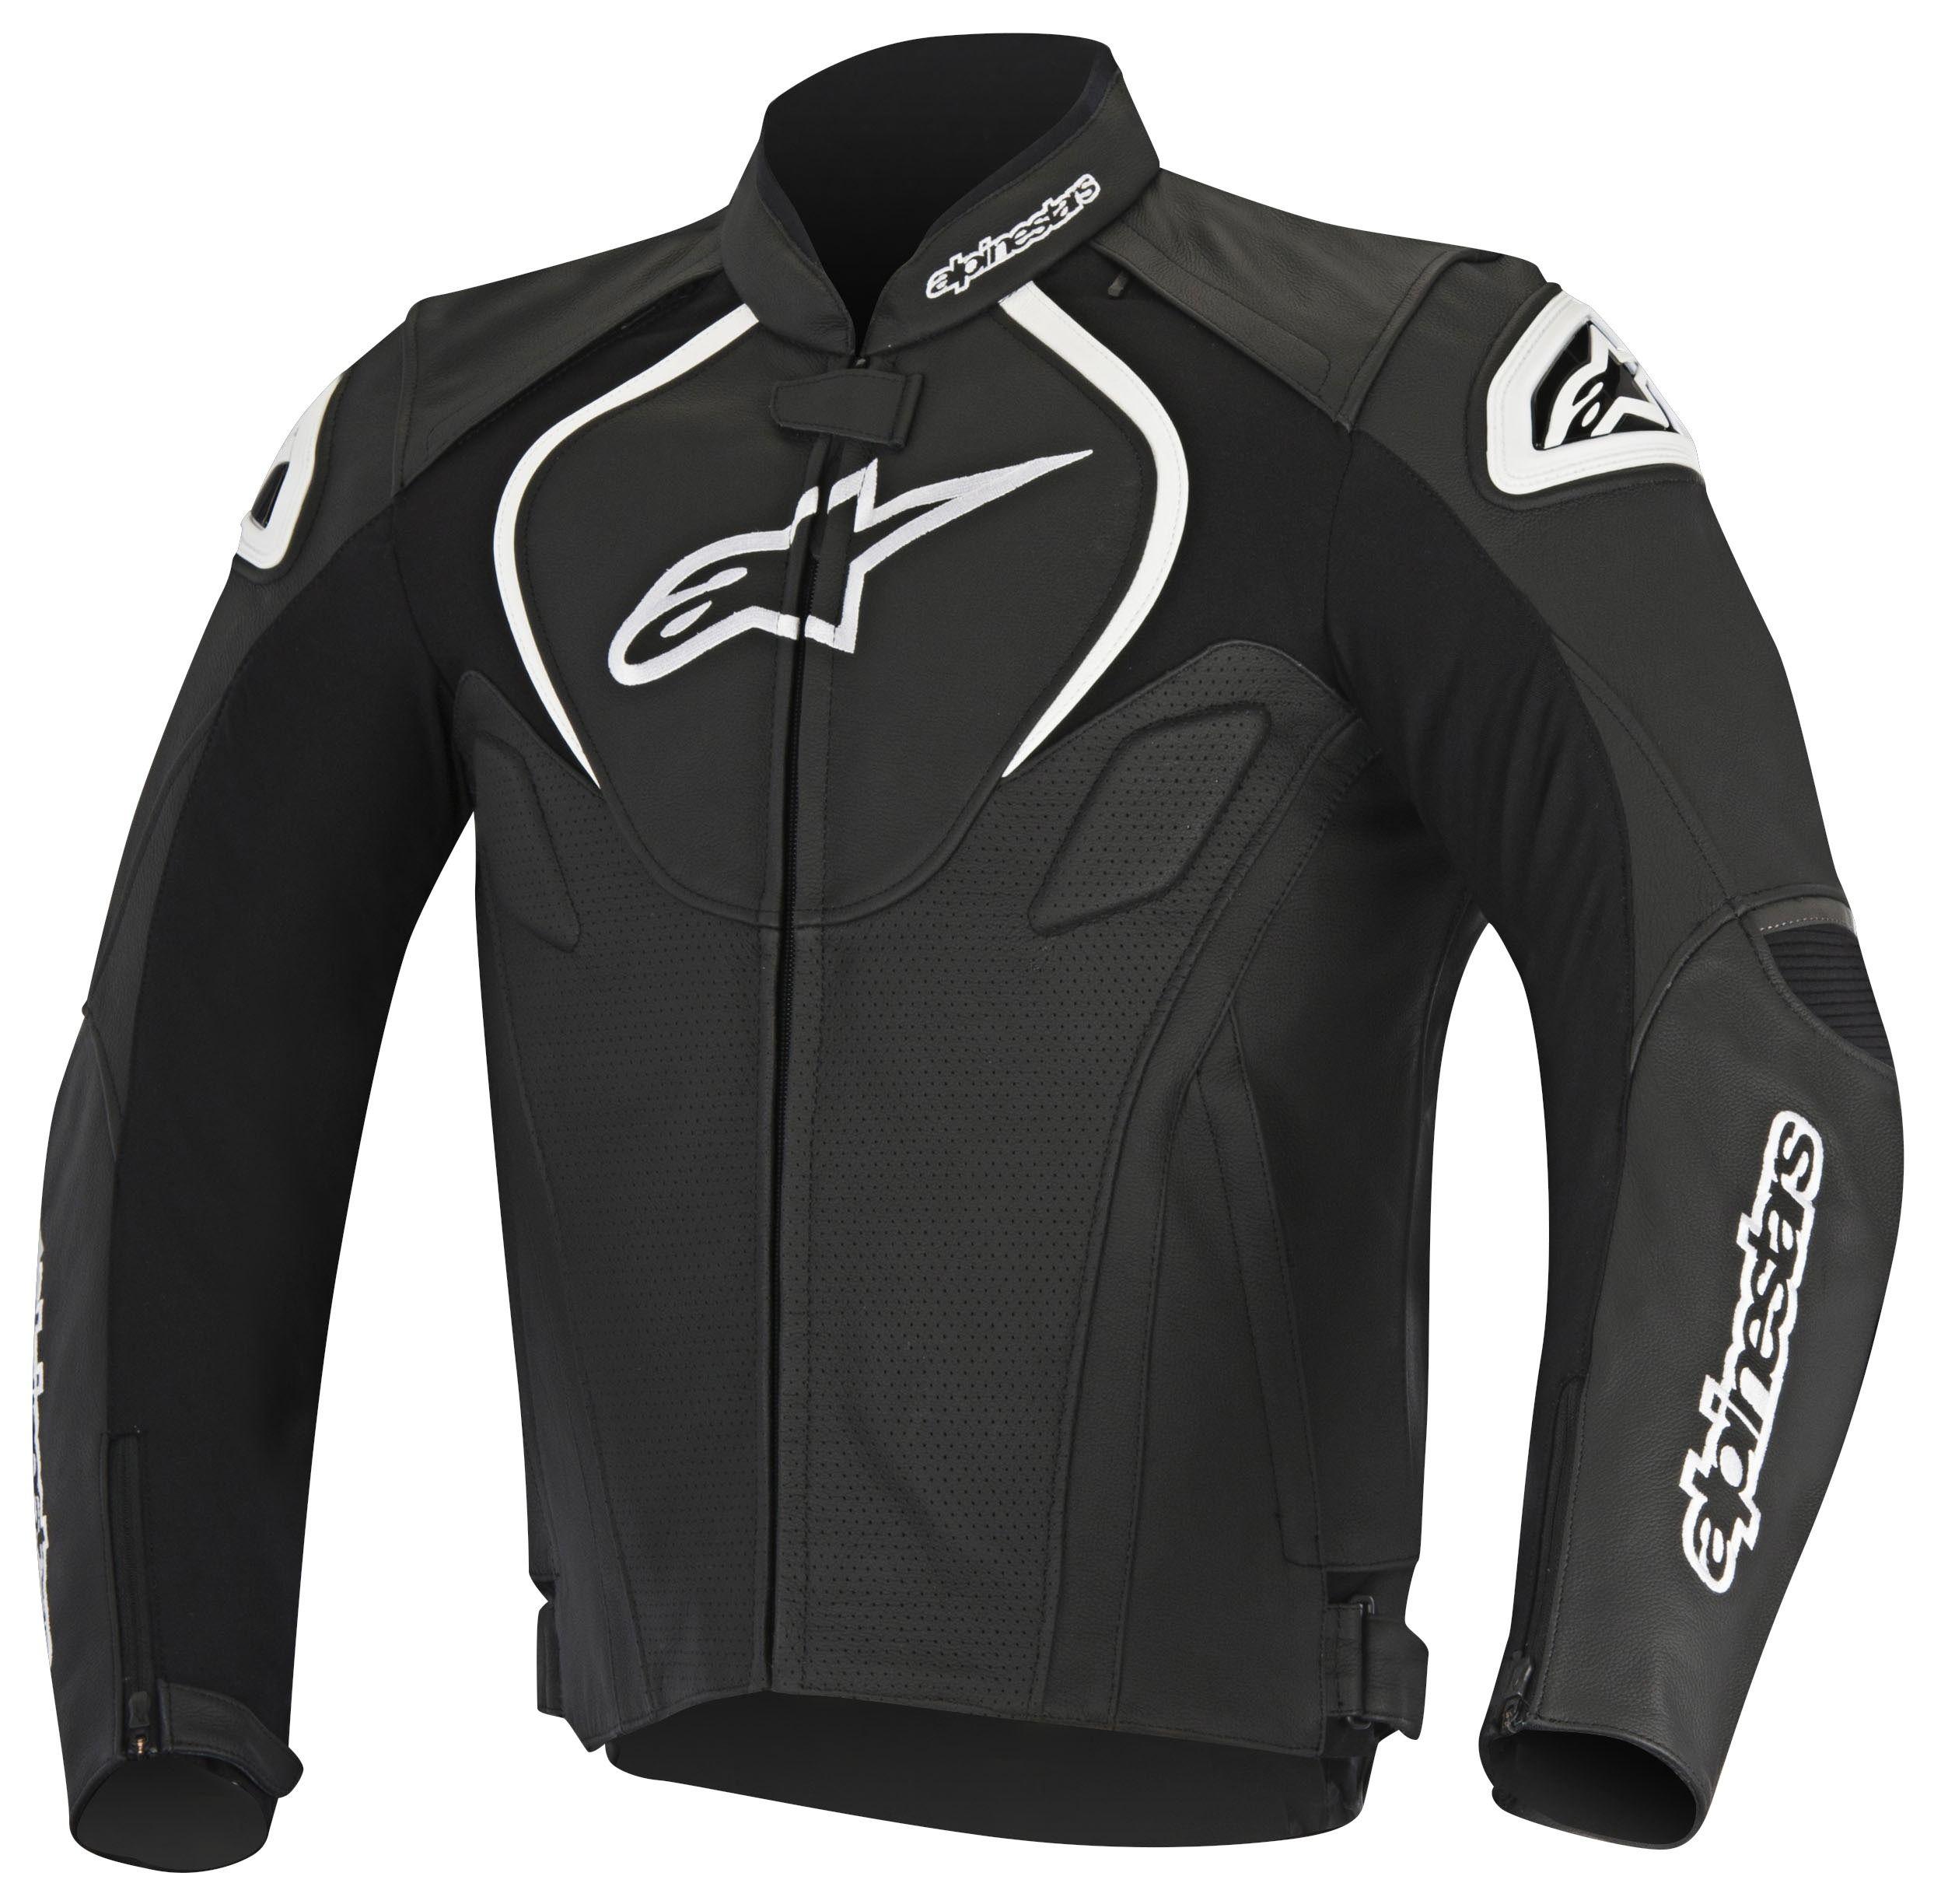 Alpinestars Jaws Perforated Leather Jacket 20 99 99 Off Revzilla Leather Jacket Black Leather Jacket Details Jackets